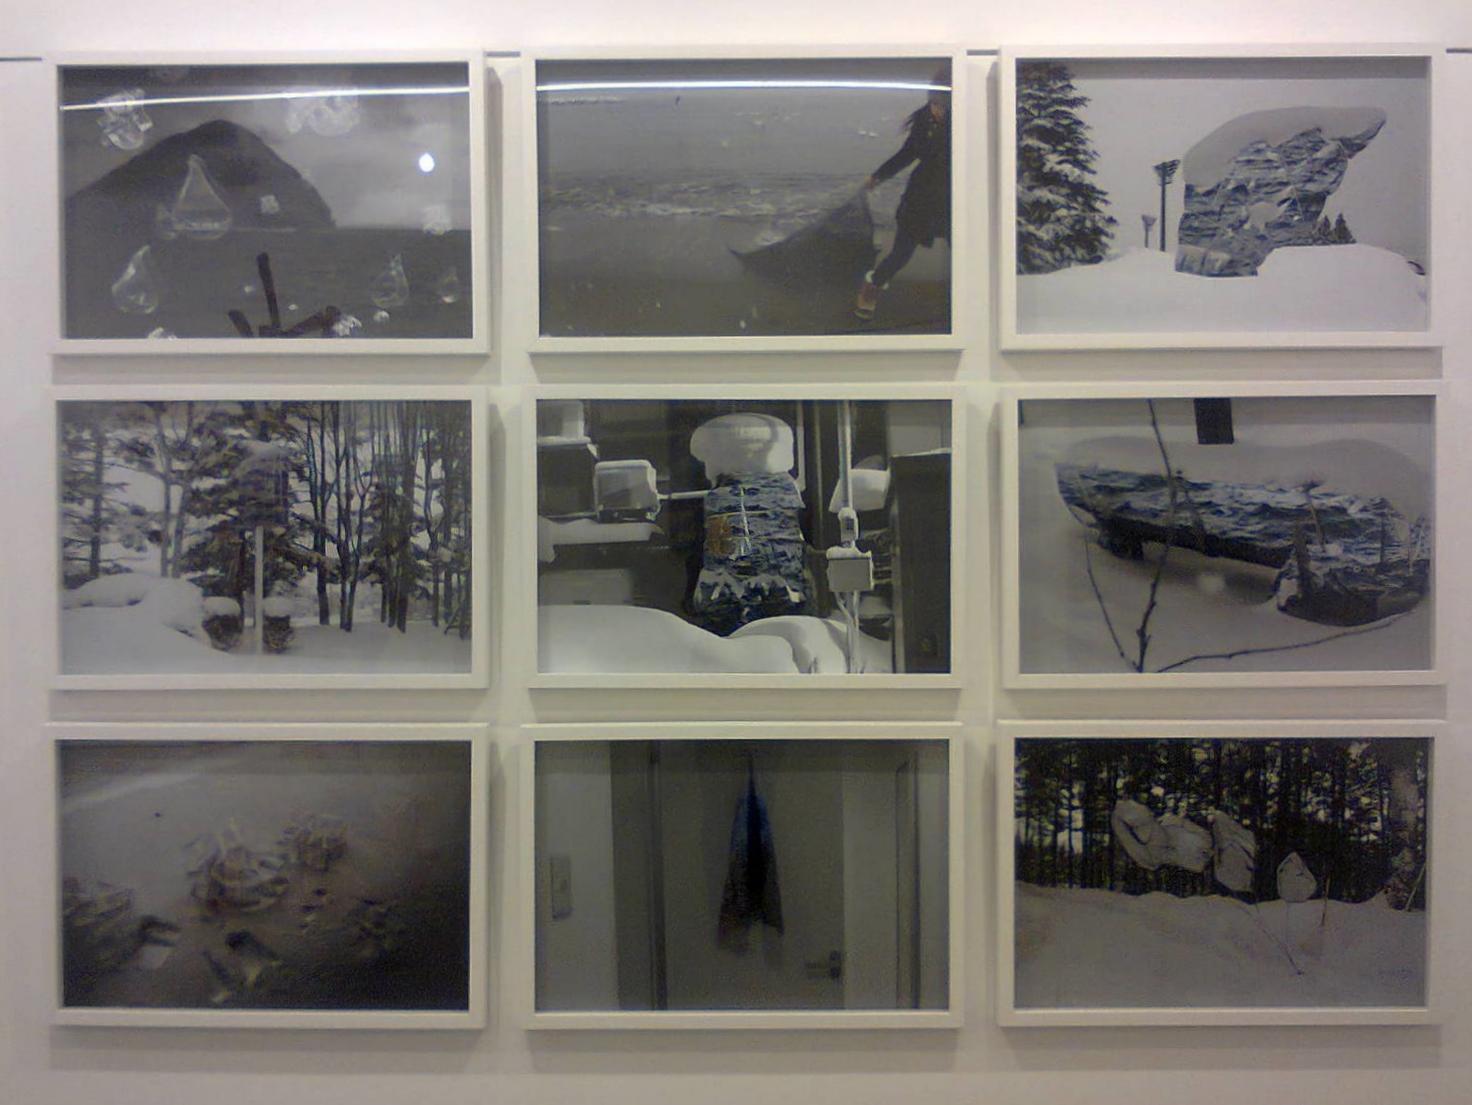 JOO Choon Lin   Supersensible Realm (video stills)  2011 Edition of 52 A/P 39 x 59 cm (image)